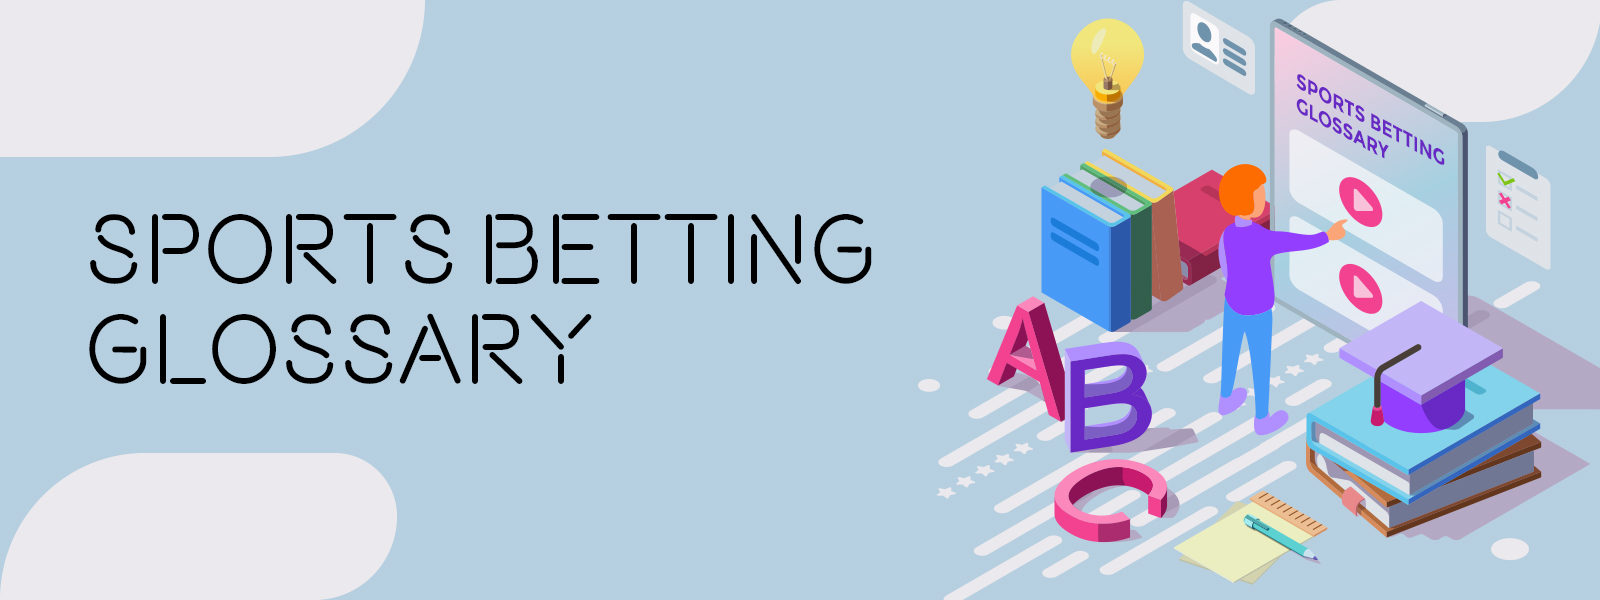 Understand Sports Betting Glossary